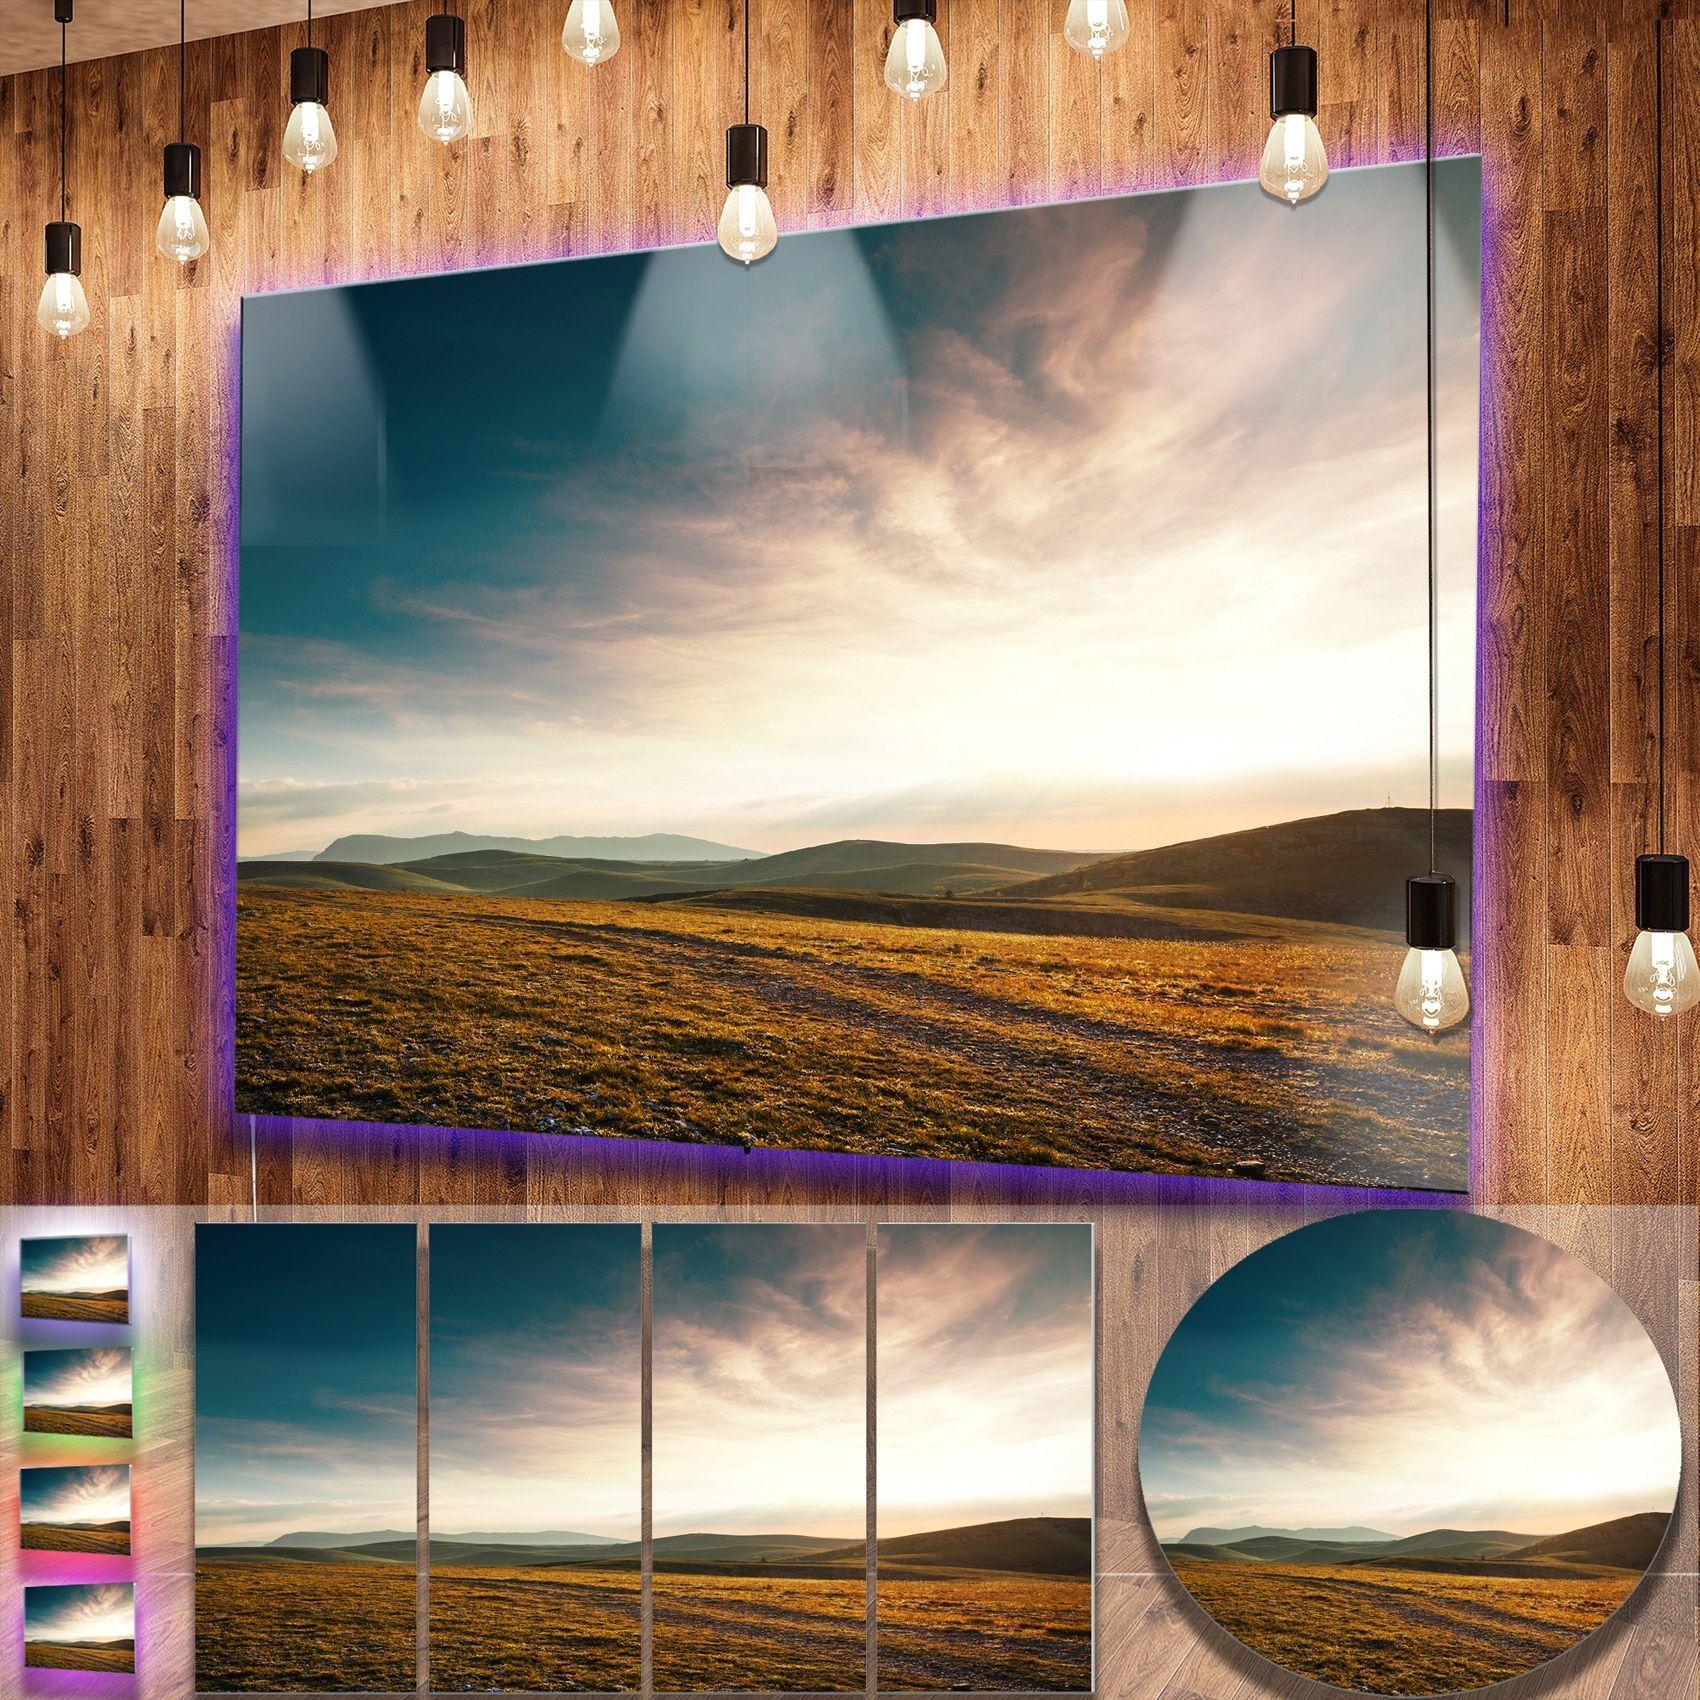 DESIGN ART Designart 'Pathway over Mountains At Sunset' Oversized Landscape Photography on Aluminium